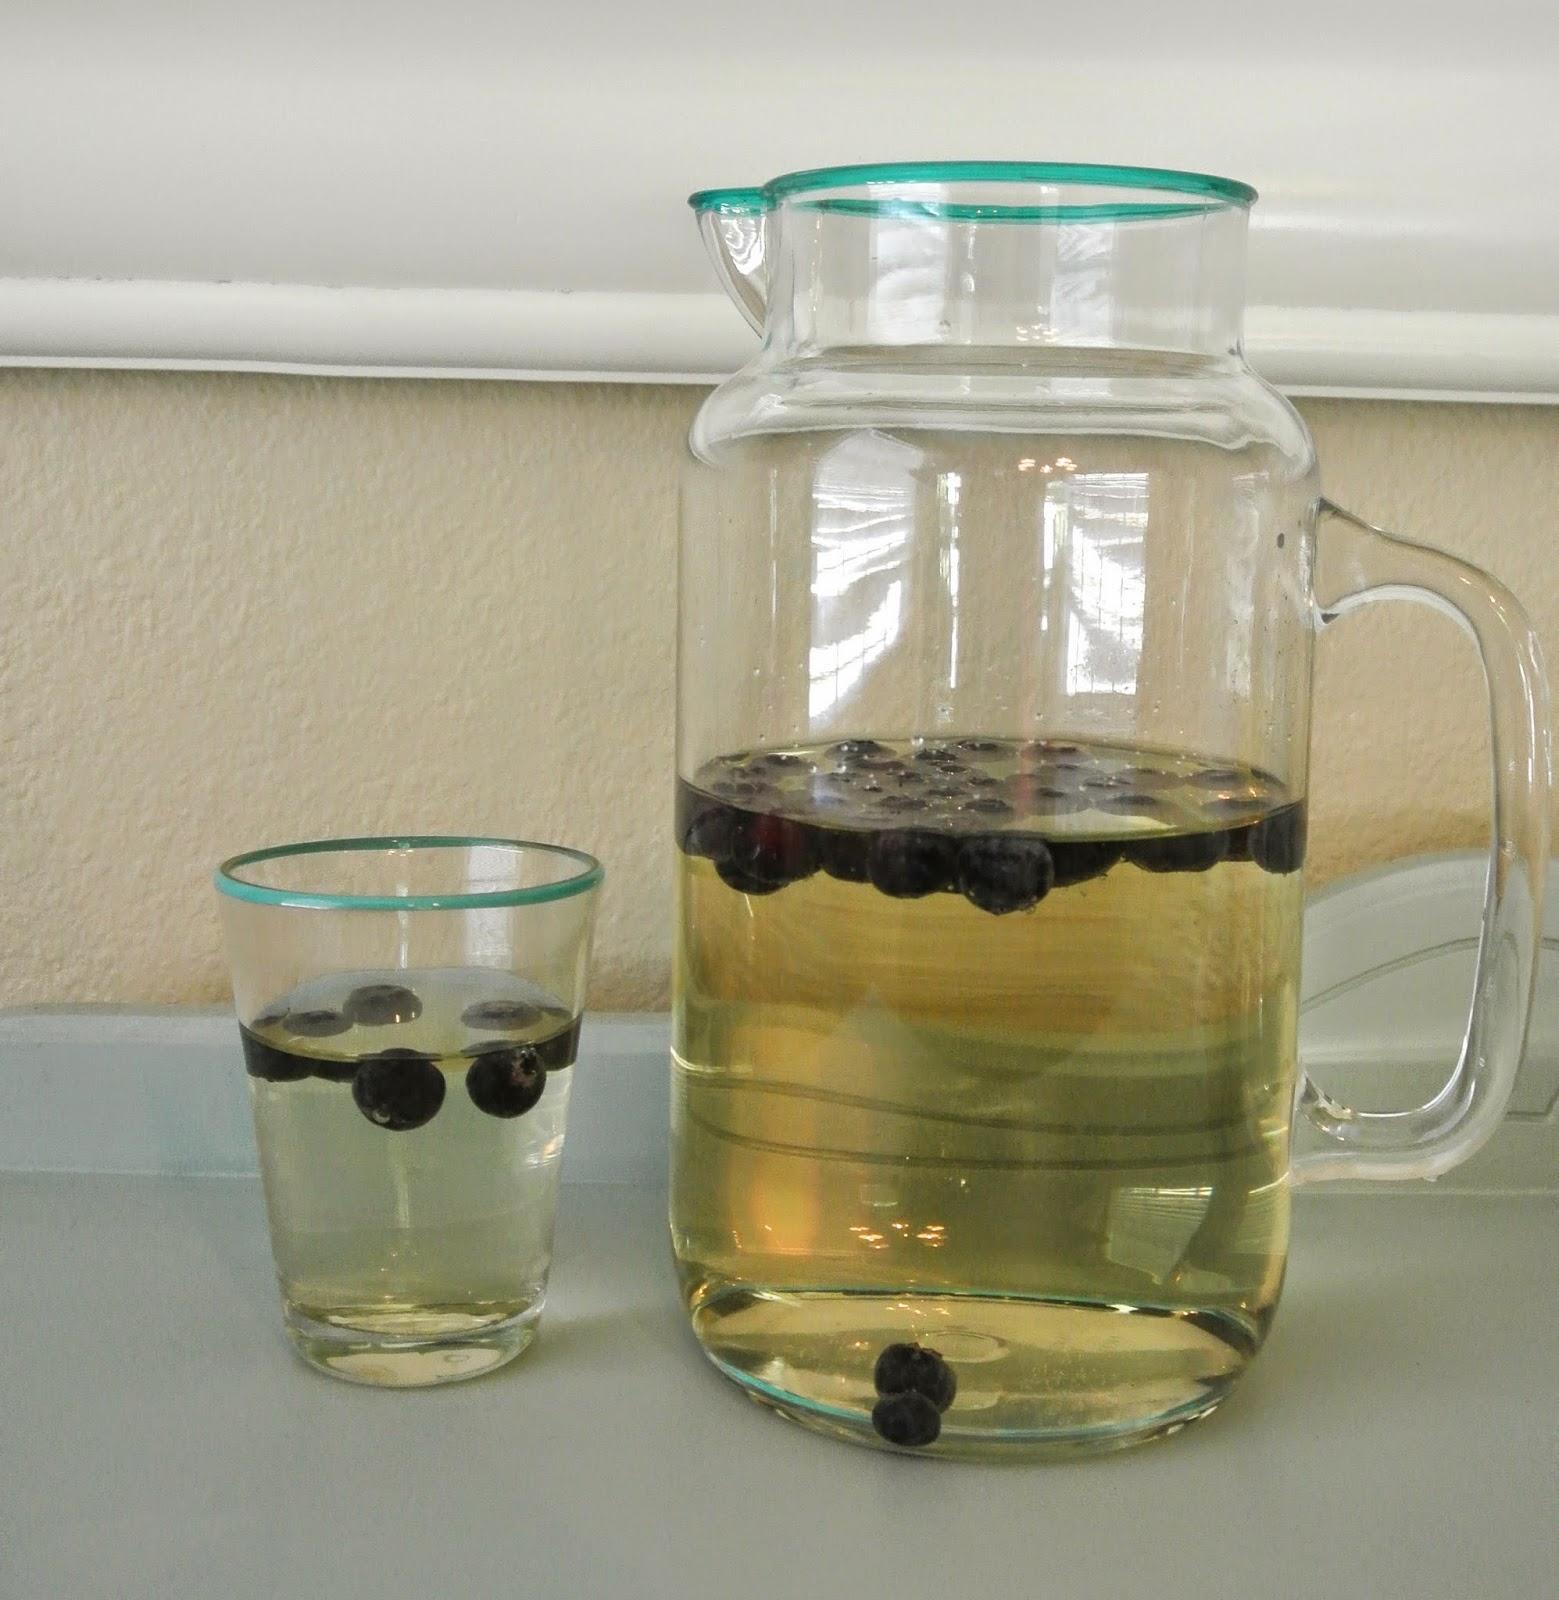 Sasea decor blueberry sangria - Plastic sangria glasses ...